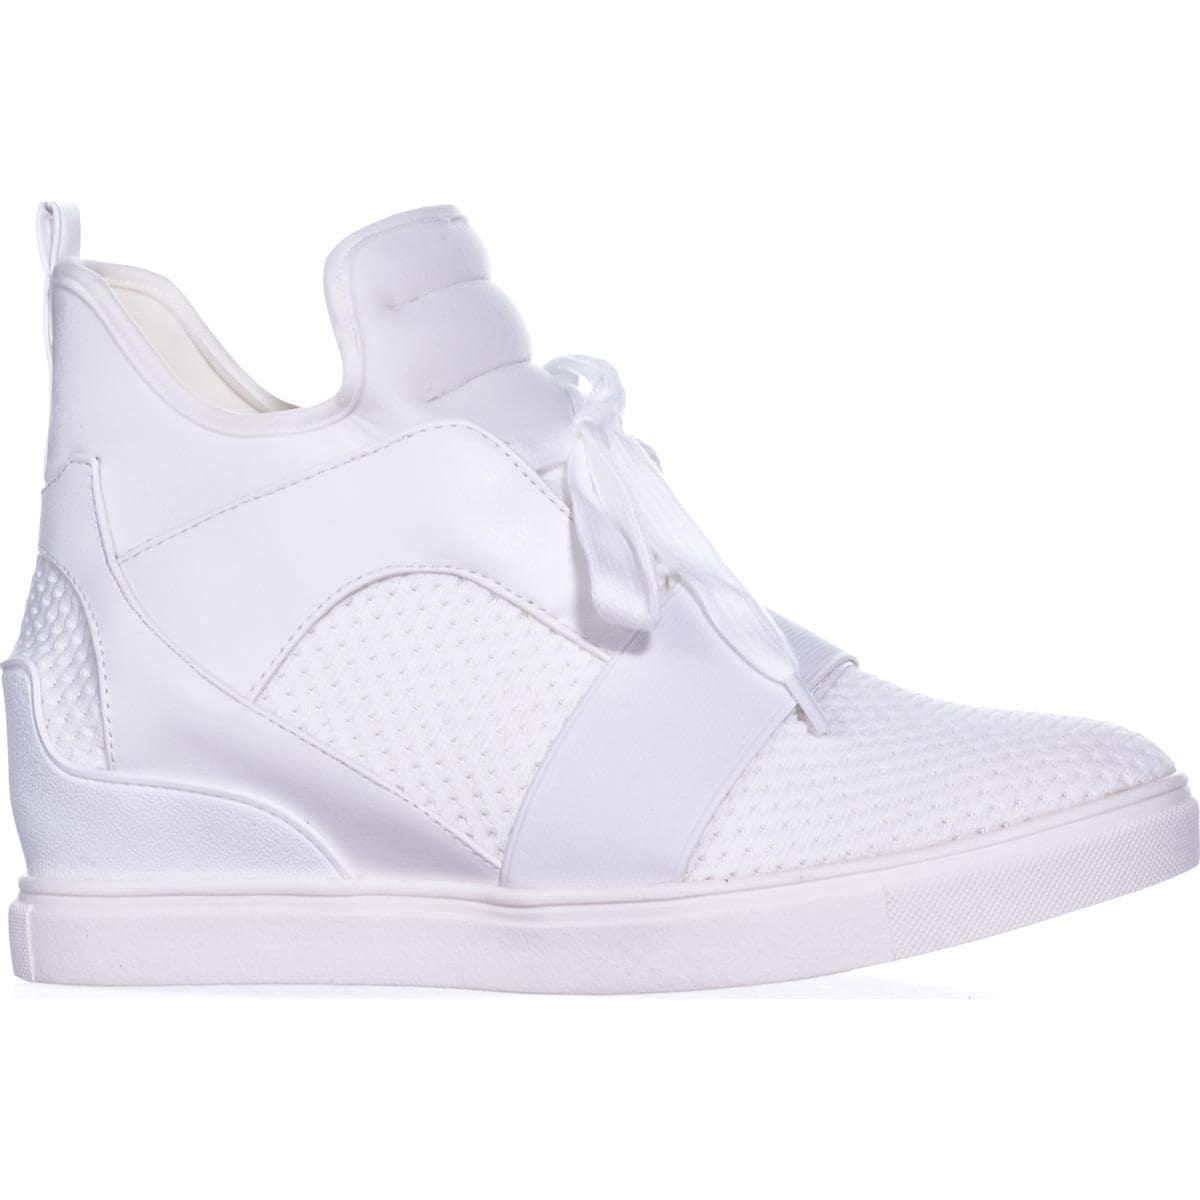 e12eae54fa0 Steve Madden Lexi High Top Fashion Sneakers, White